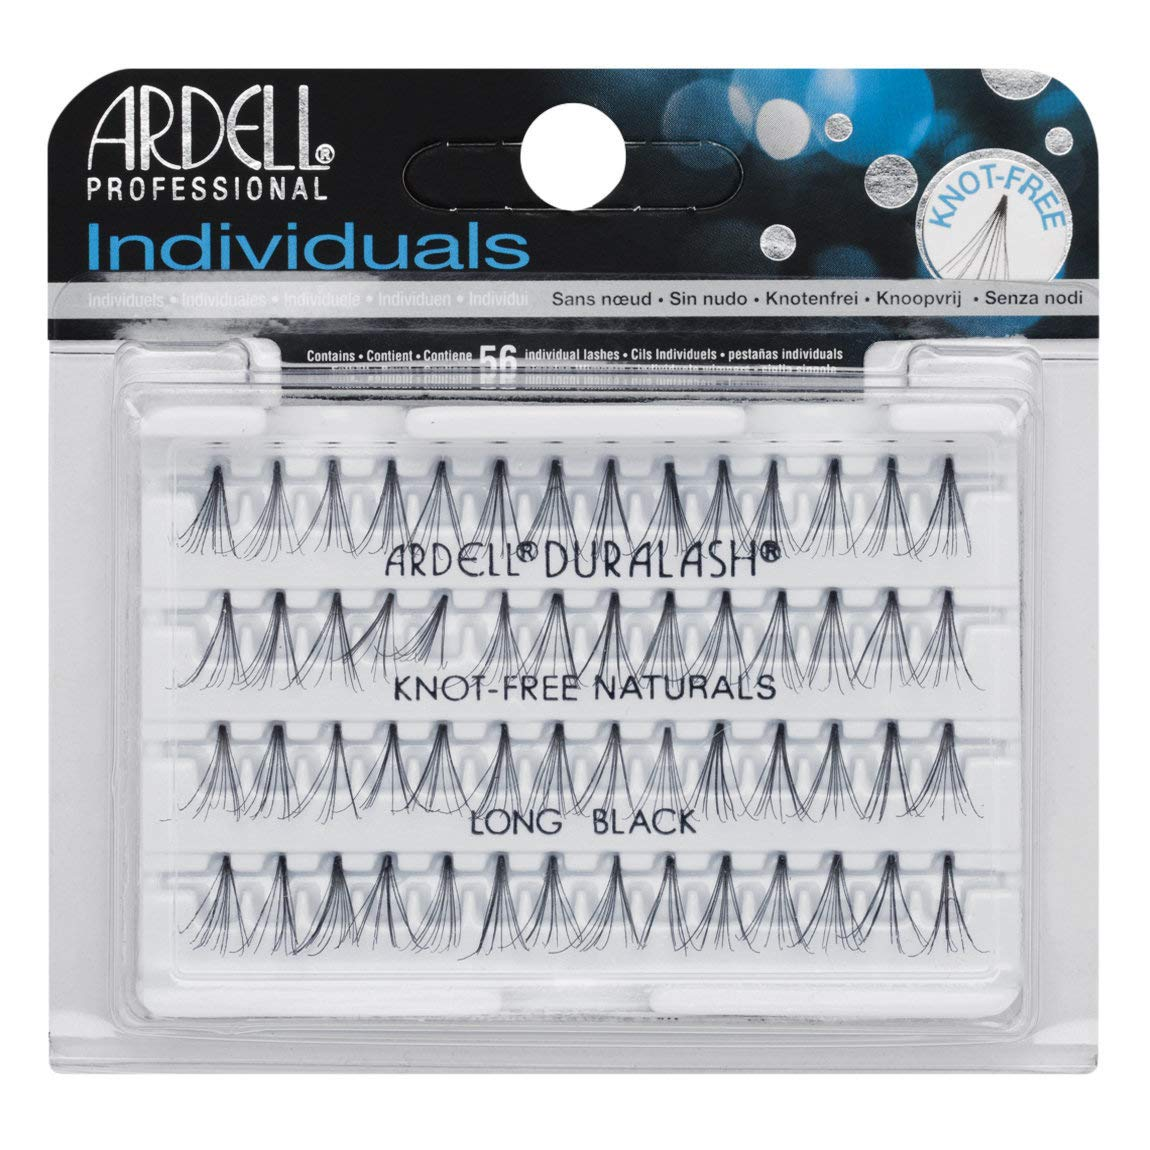 (3 Pack) ARDELL False Eyelashes - Duralash Long Black usa-iiu-tm842